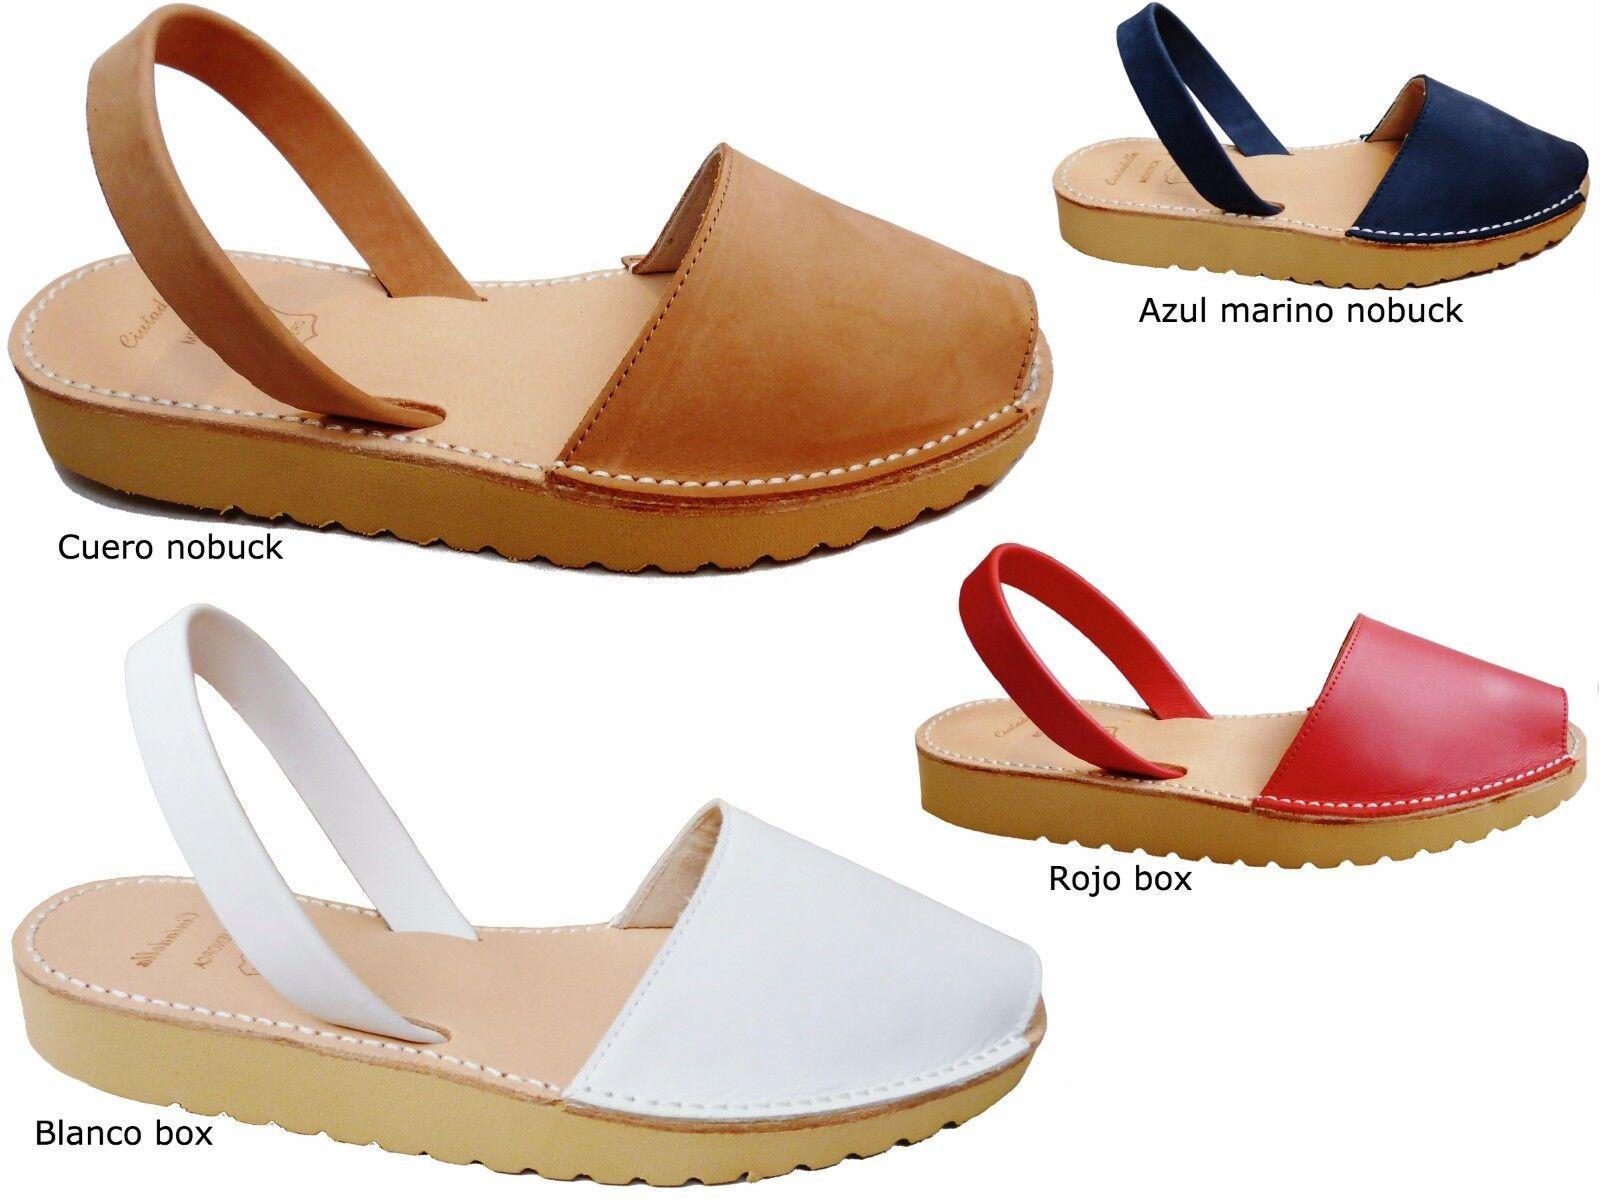 Avarcas menorquínas menorca sandals silverFORMA 2,5 cm  BEIGE real spain abarcas